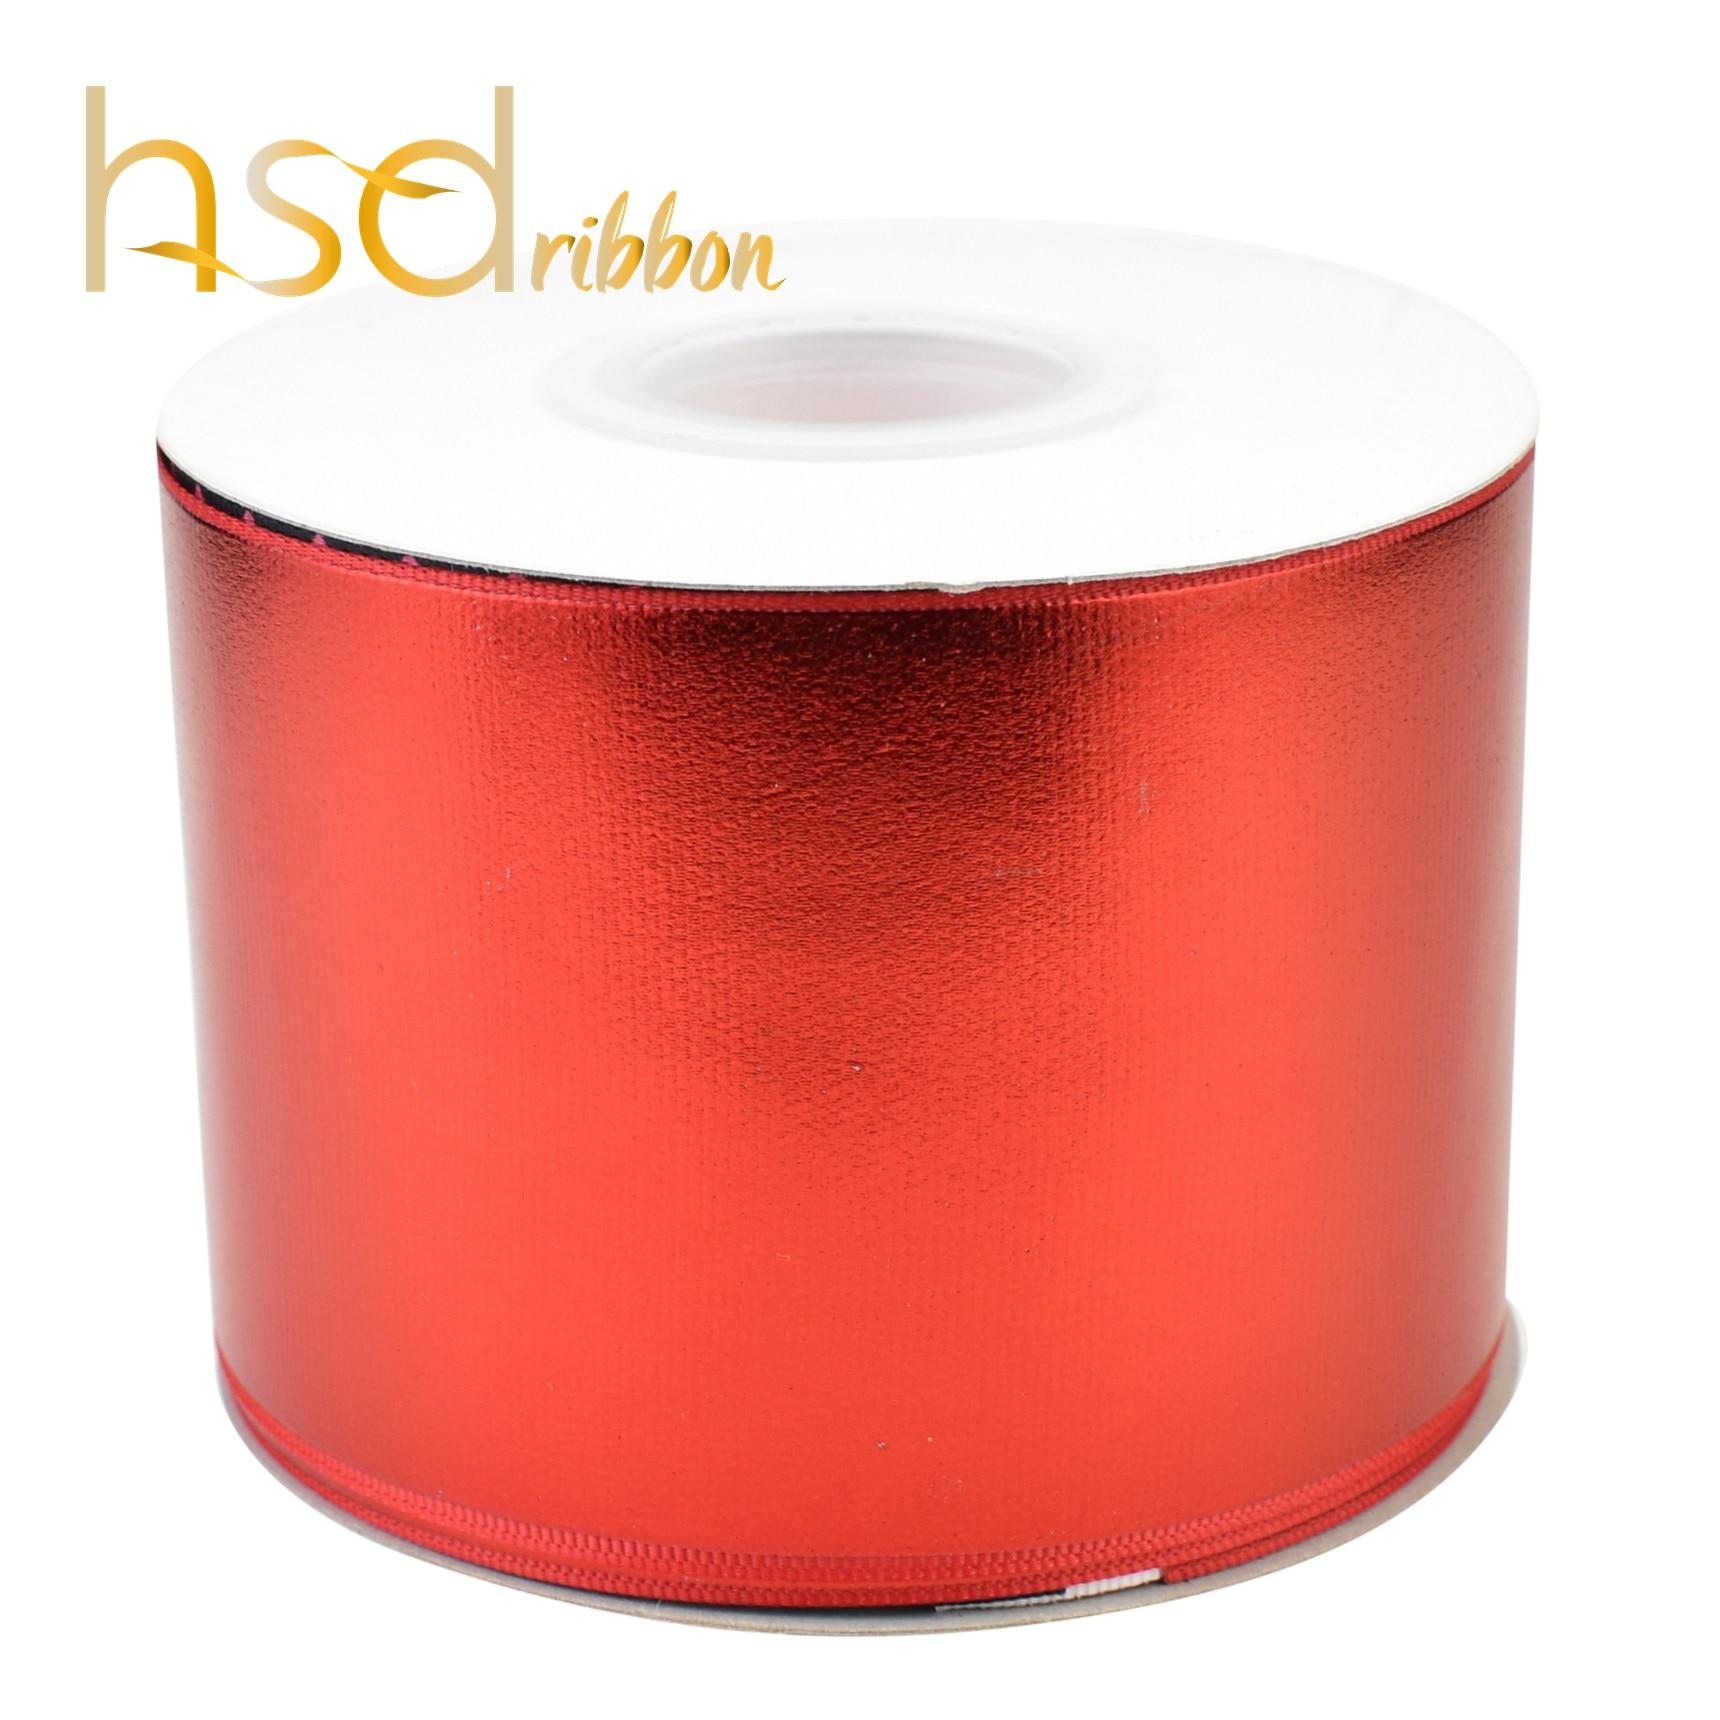 Hsdribbon 75mm 3inch Soild Rood goud folie grosgrain lint-in Linten van Huis & Tuin op  Groep 1